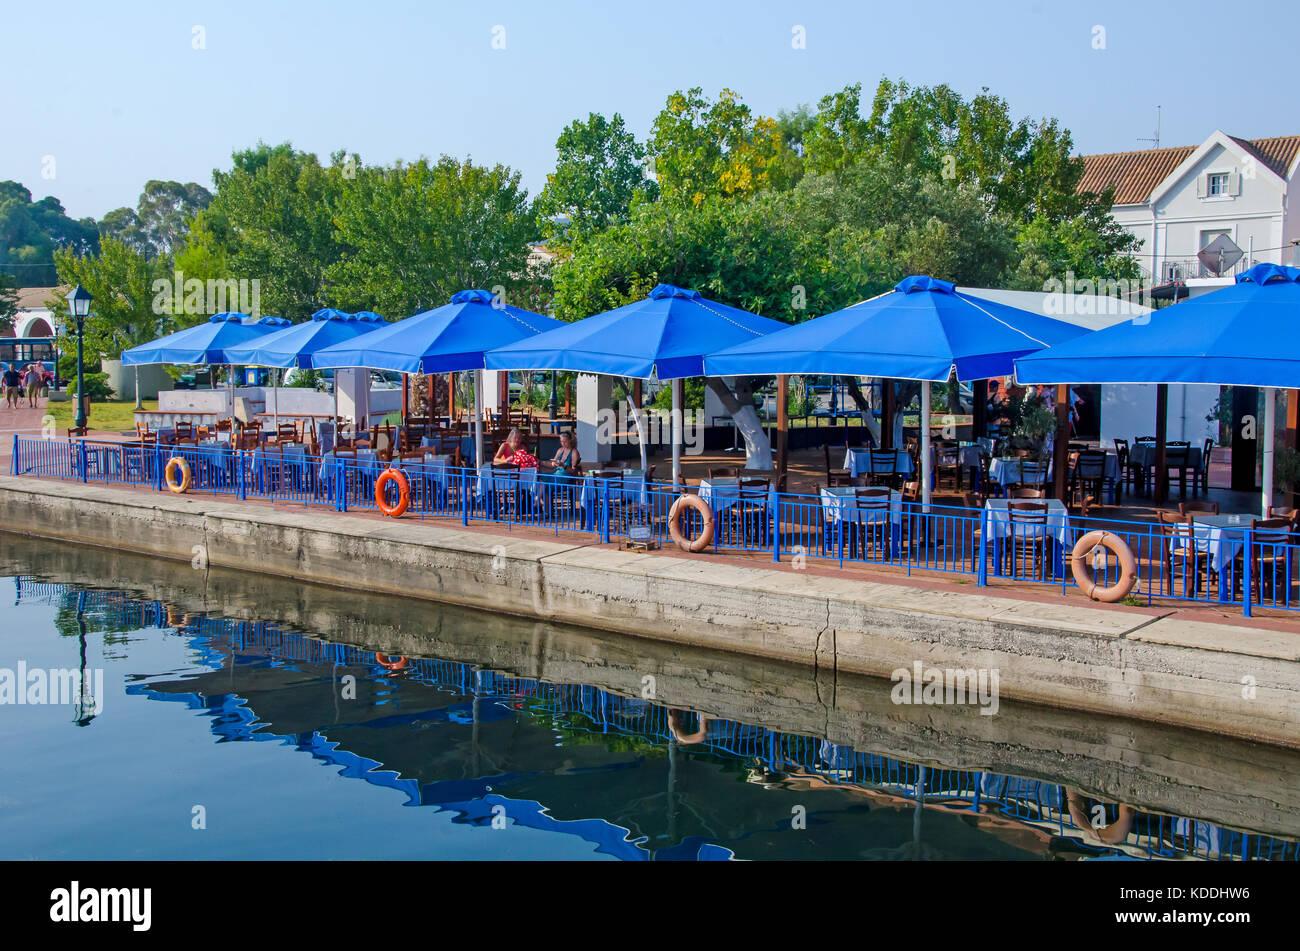 Argostoli Griechenland waterfront Seaside Cafe blau Schirme Kefalonia, Kefalonia, Ionische Inseln, Griechenland Stockbild